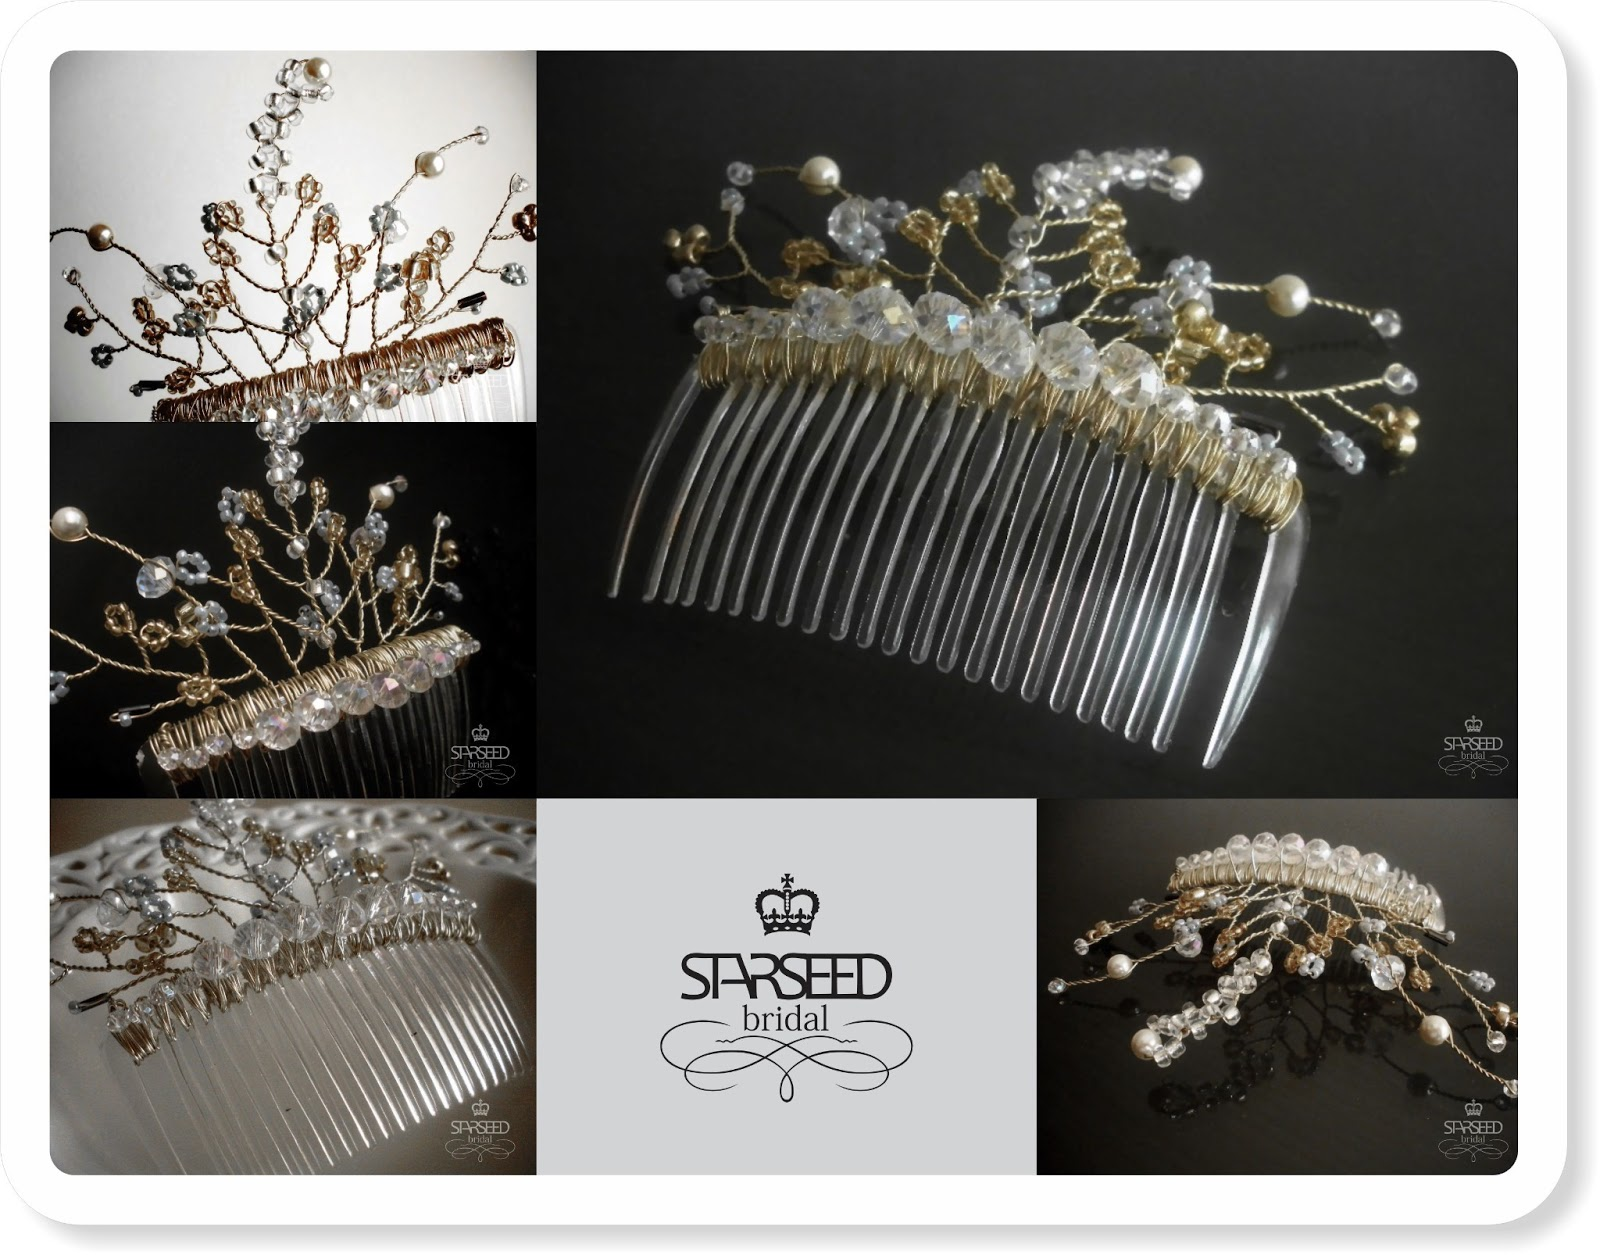 starseed handmade jewelry: bridal hair accessories and jewelry